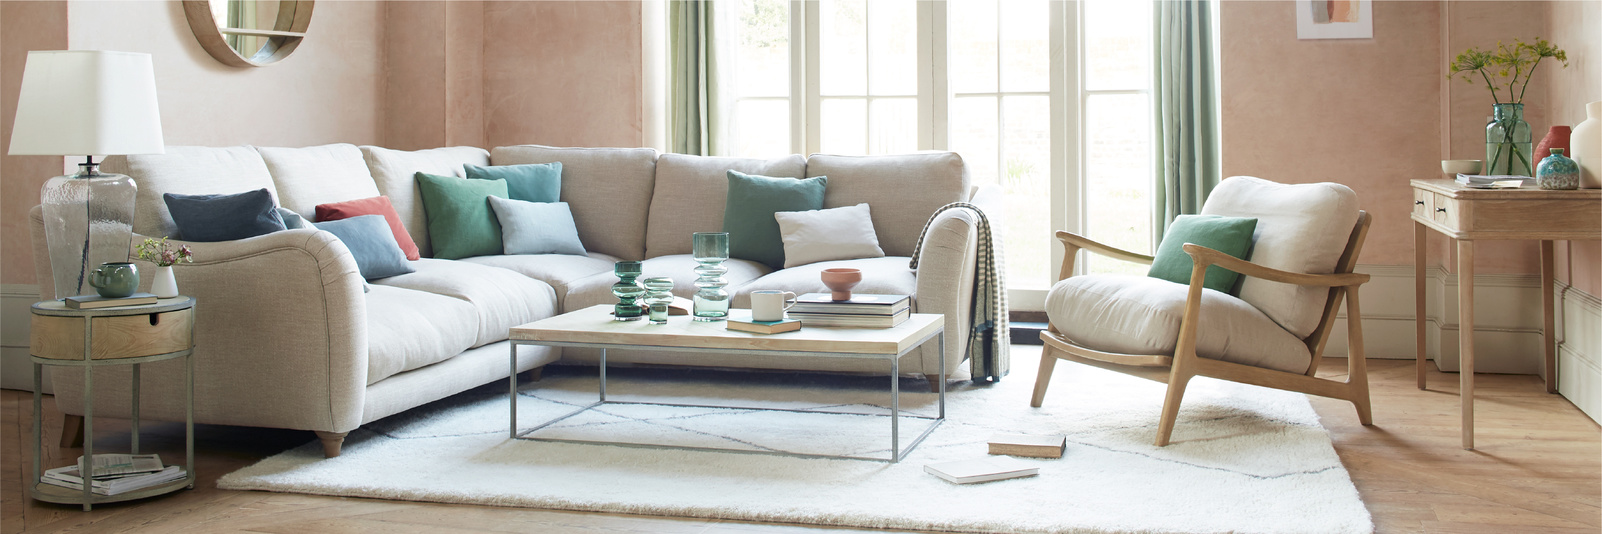 Bumpster corner sofa